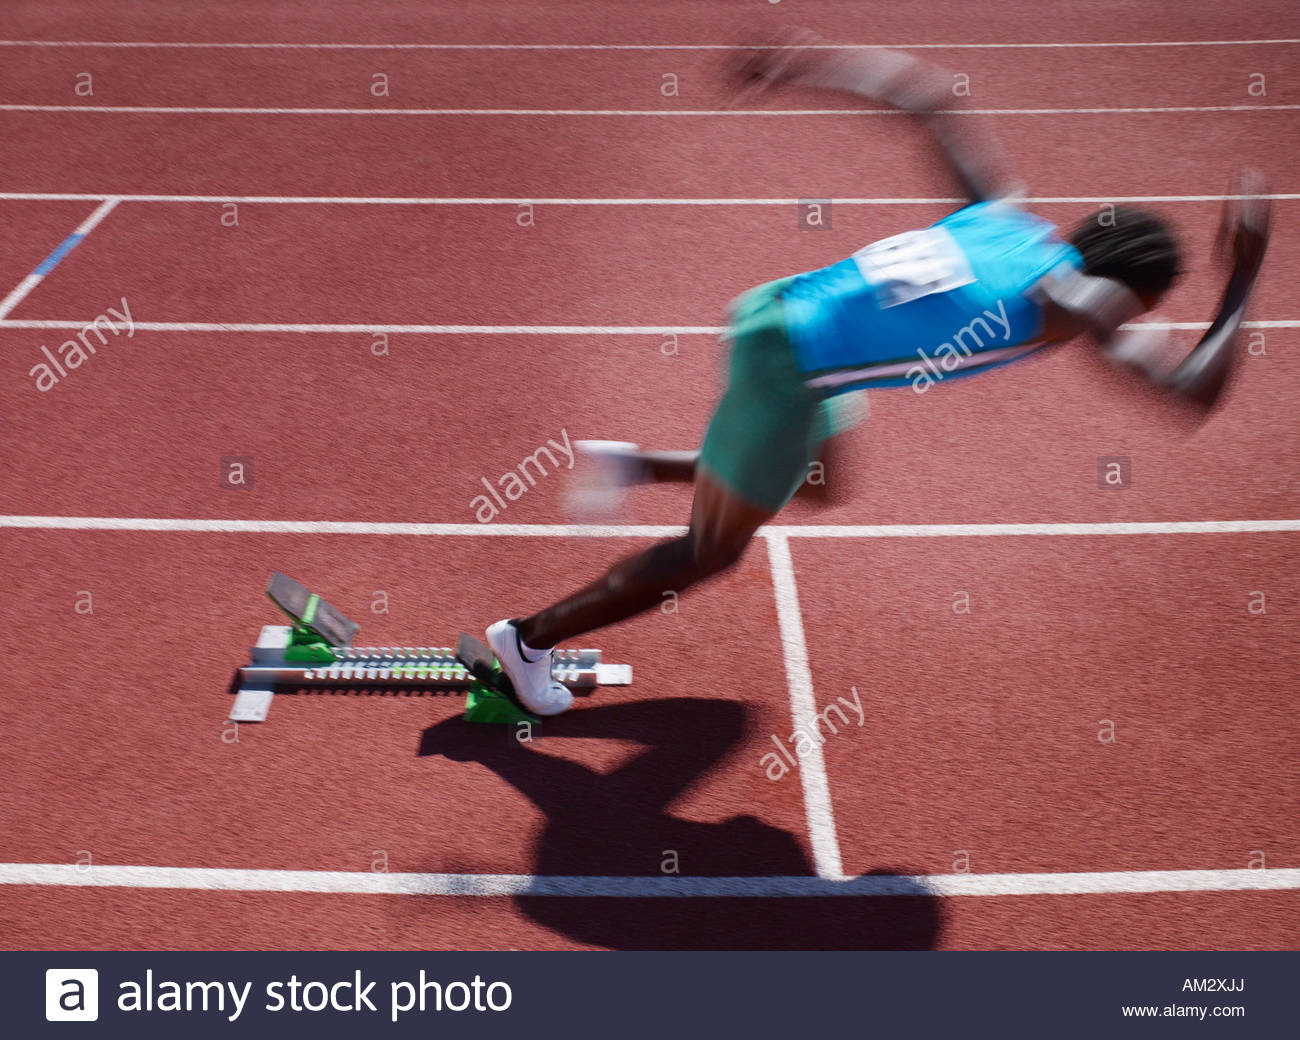 Racer at start line on track - Stock Image